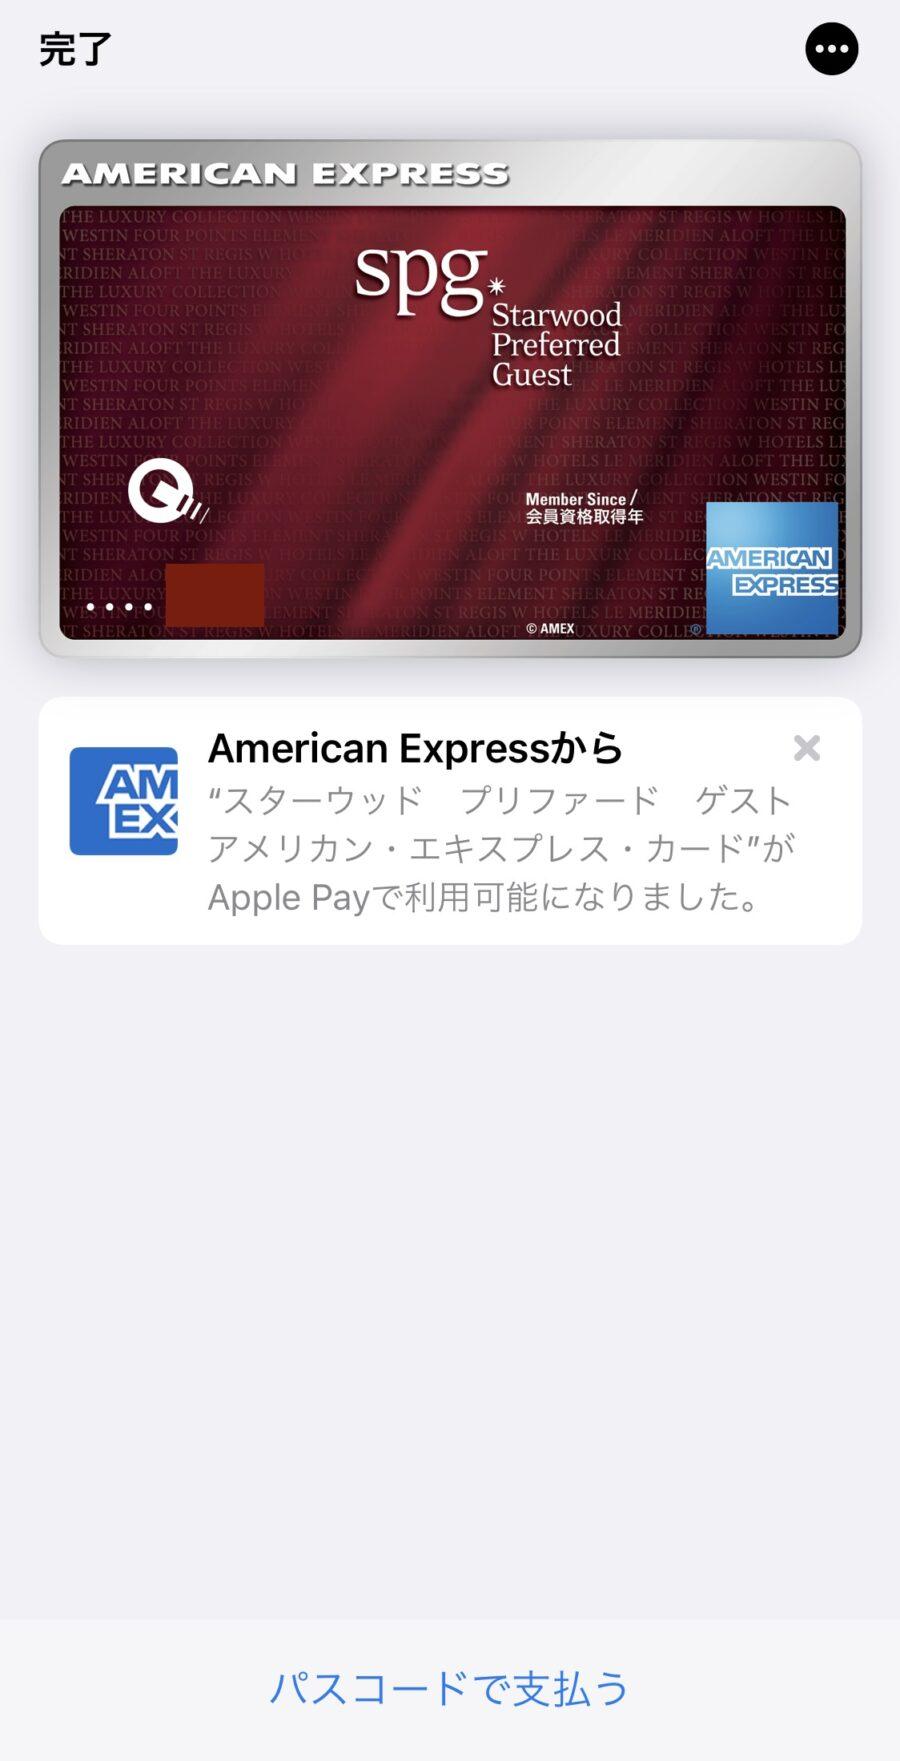 Apple Pay(Walletアプリ)のクレジットカード追加・変更方法9